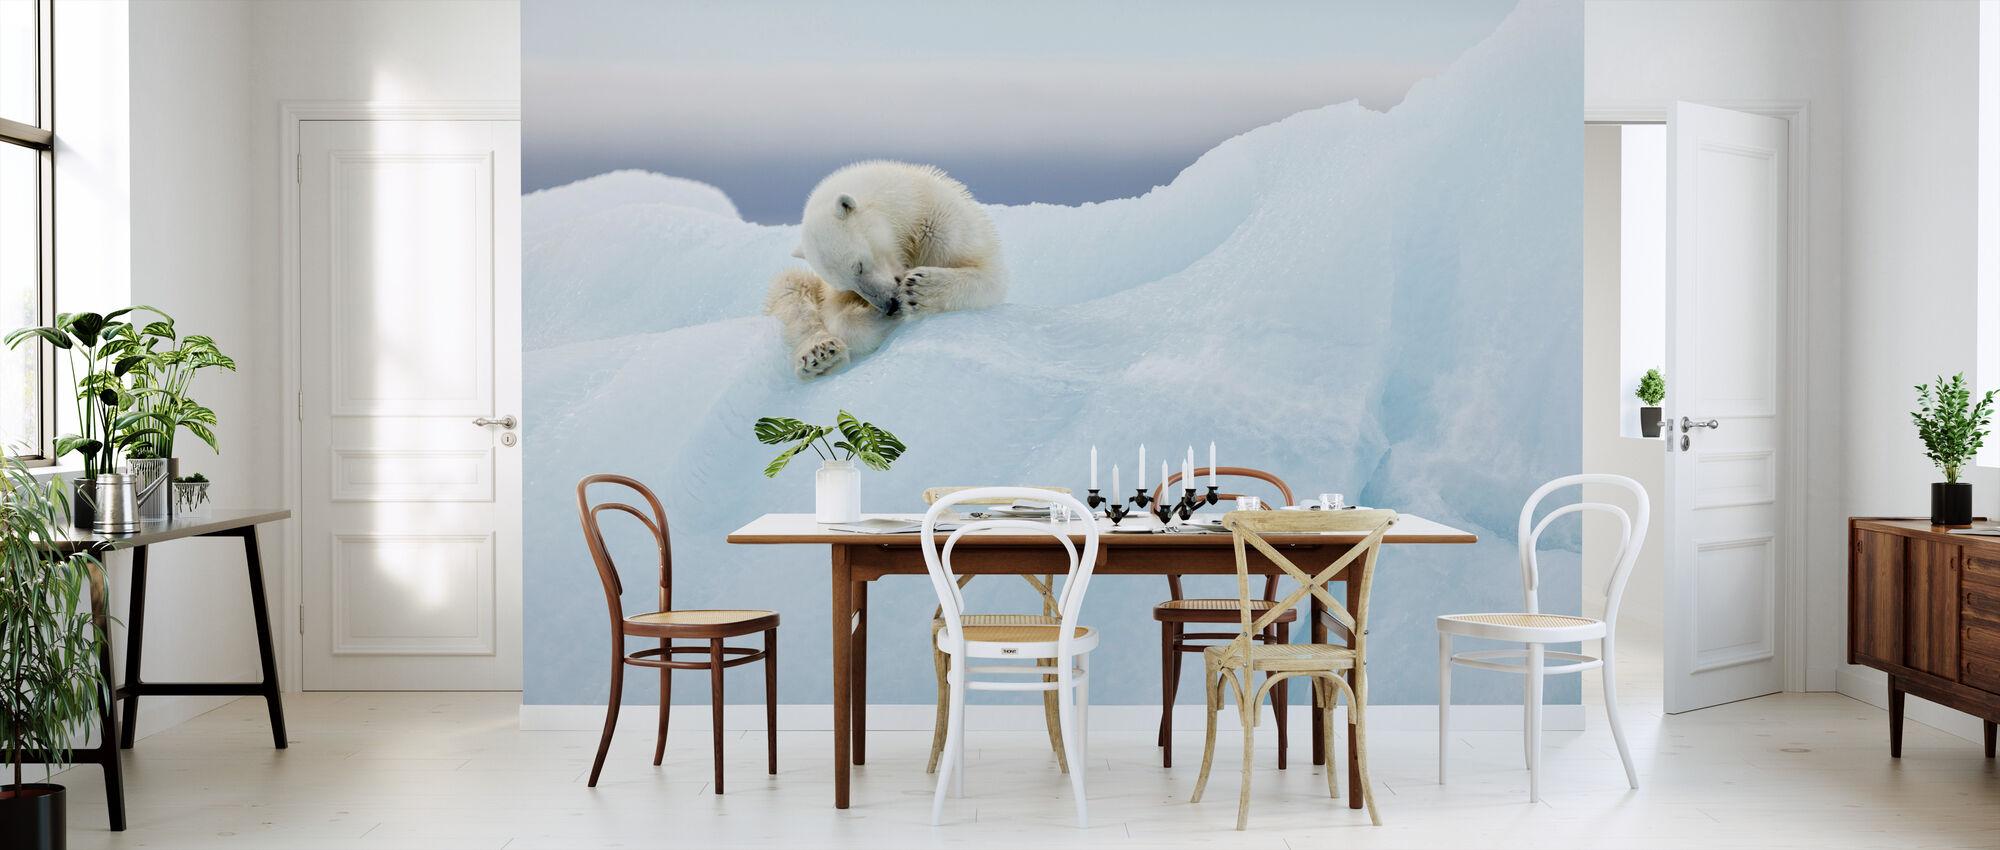 Isbjörn Grooming - Tapet - Kök